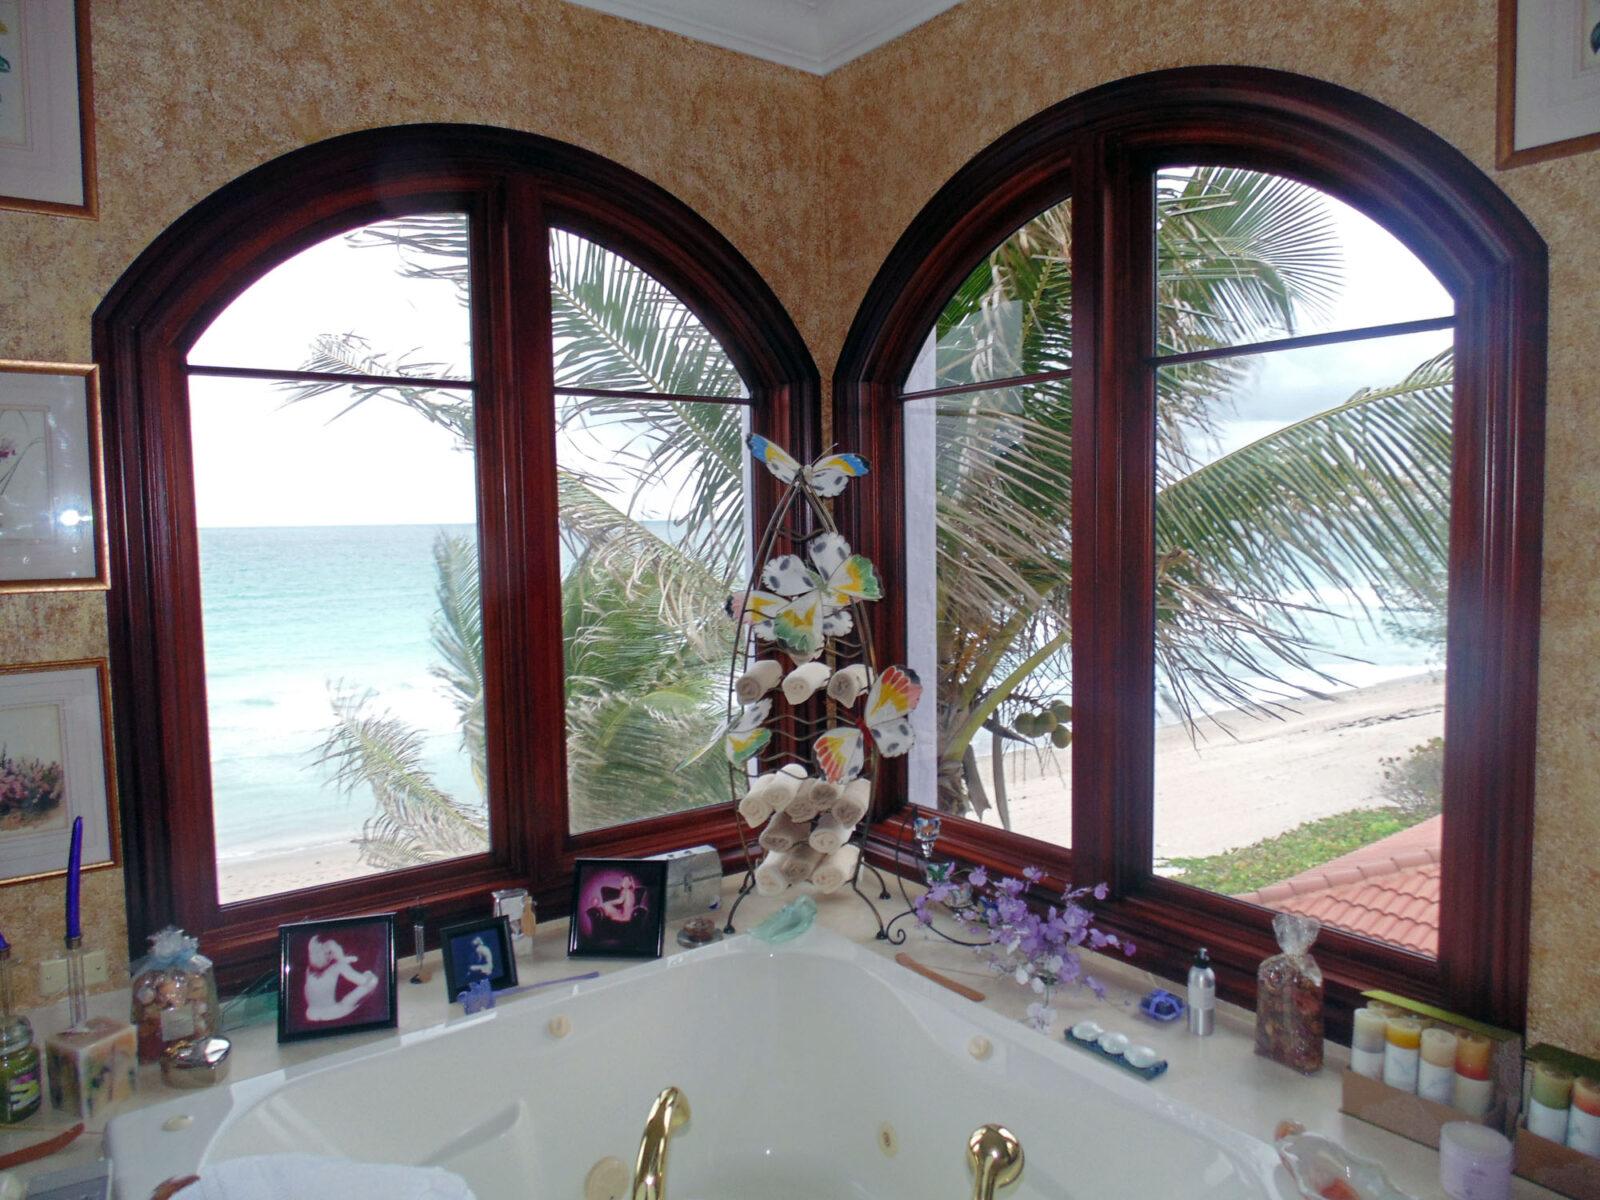 HIGHLAND BEACH MAHOGANY BATHROOM WINDOWS